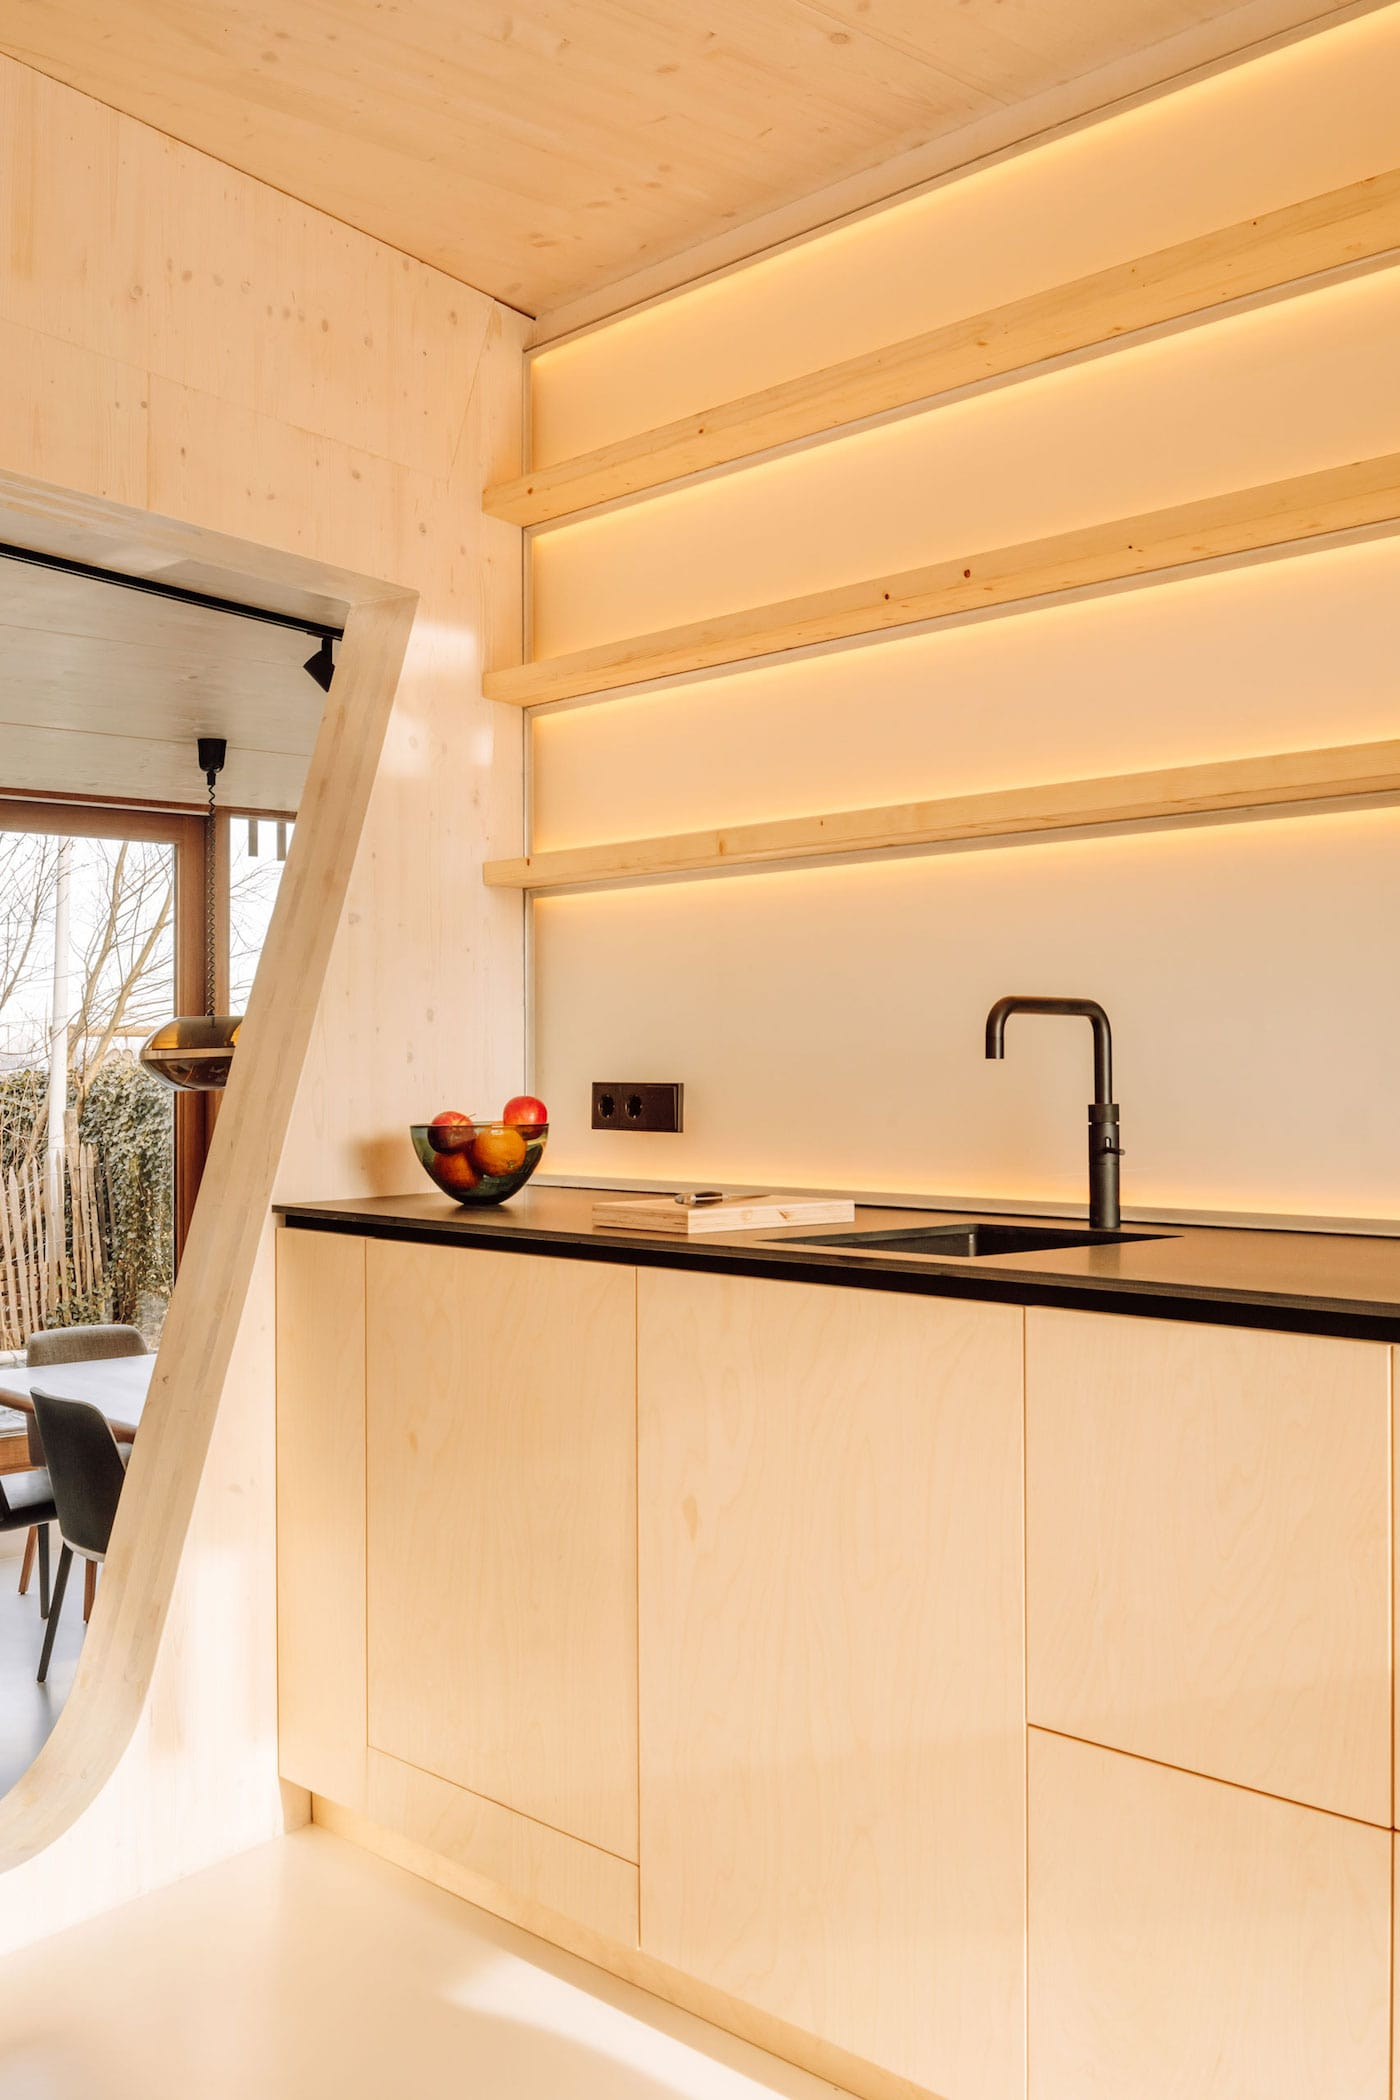 Timber kitchen with LED lighting under shelves